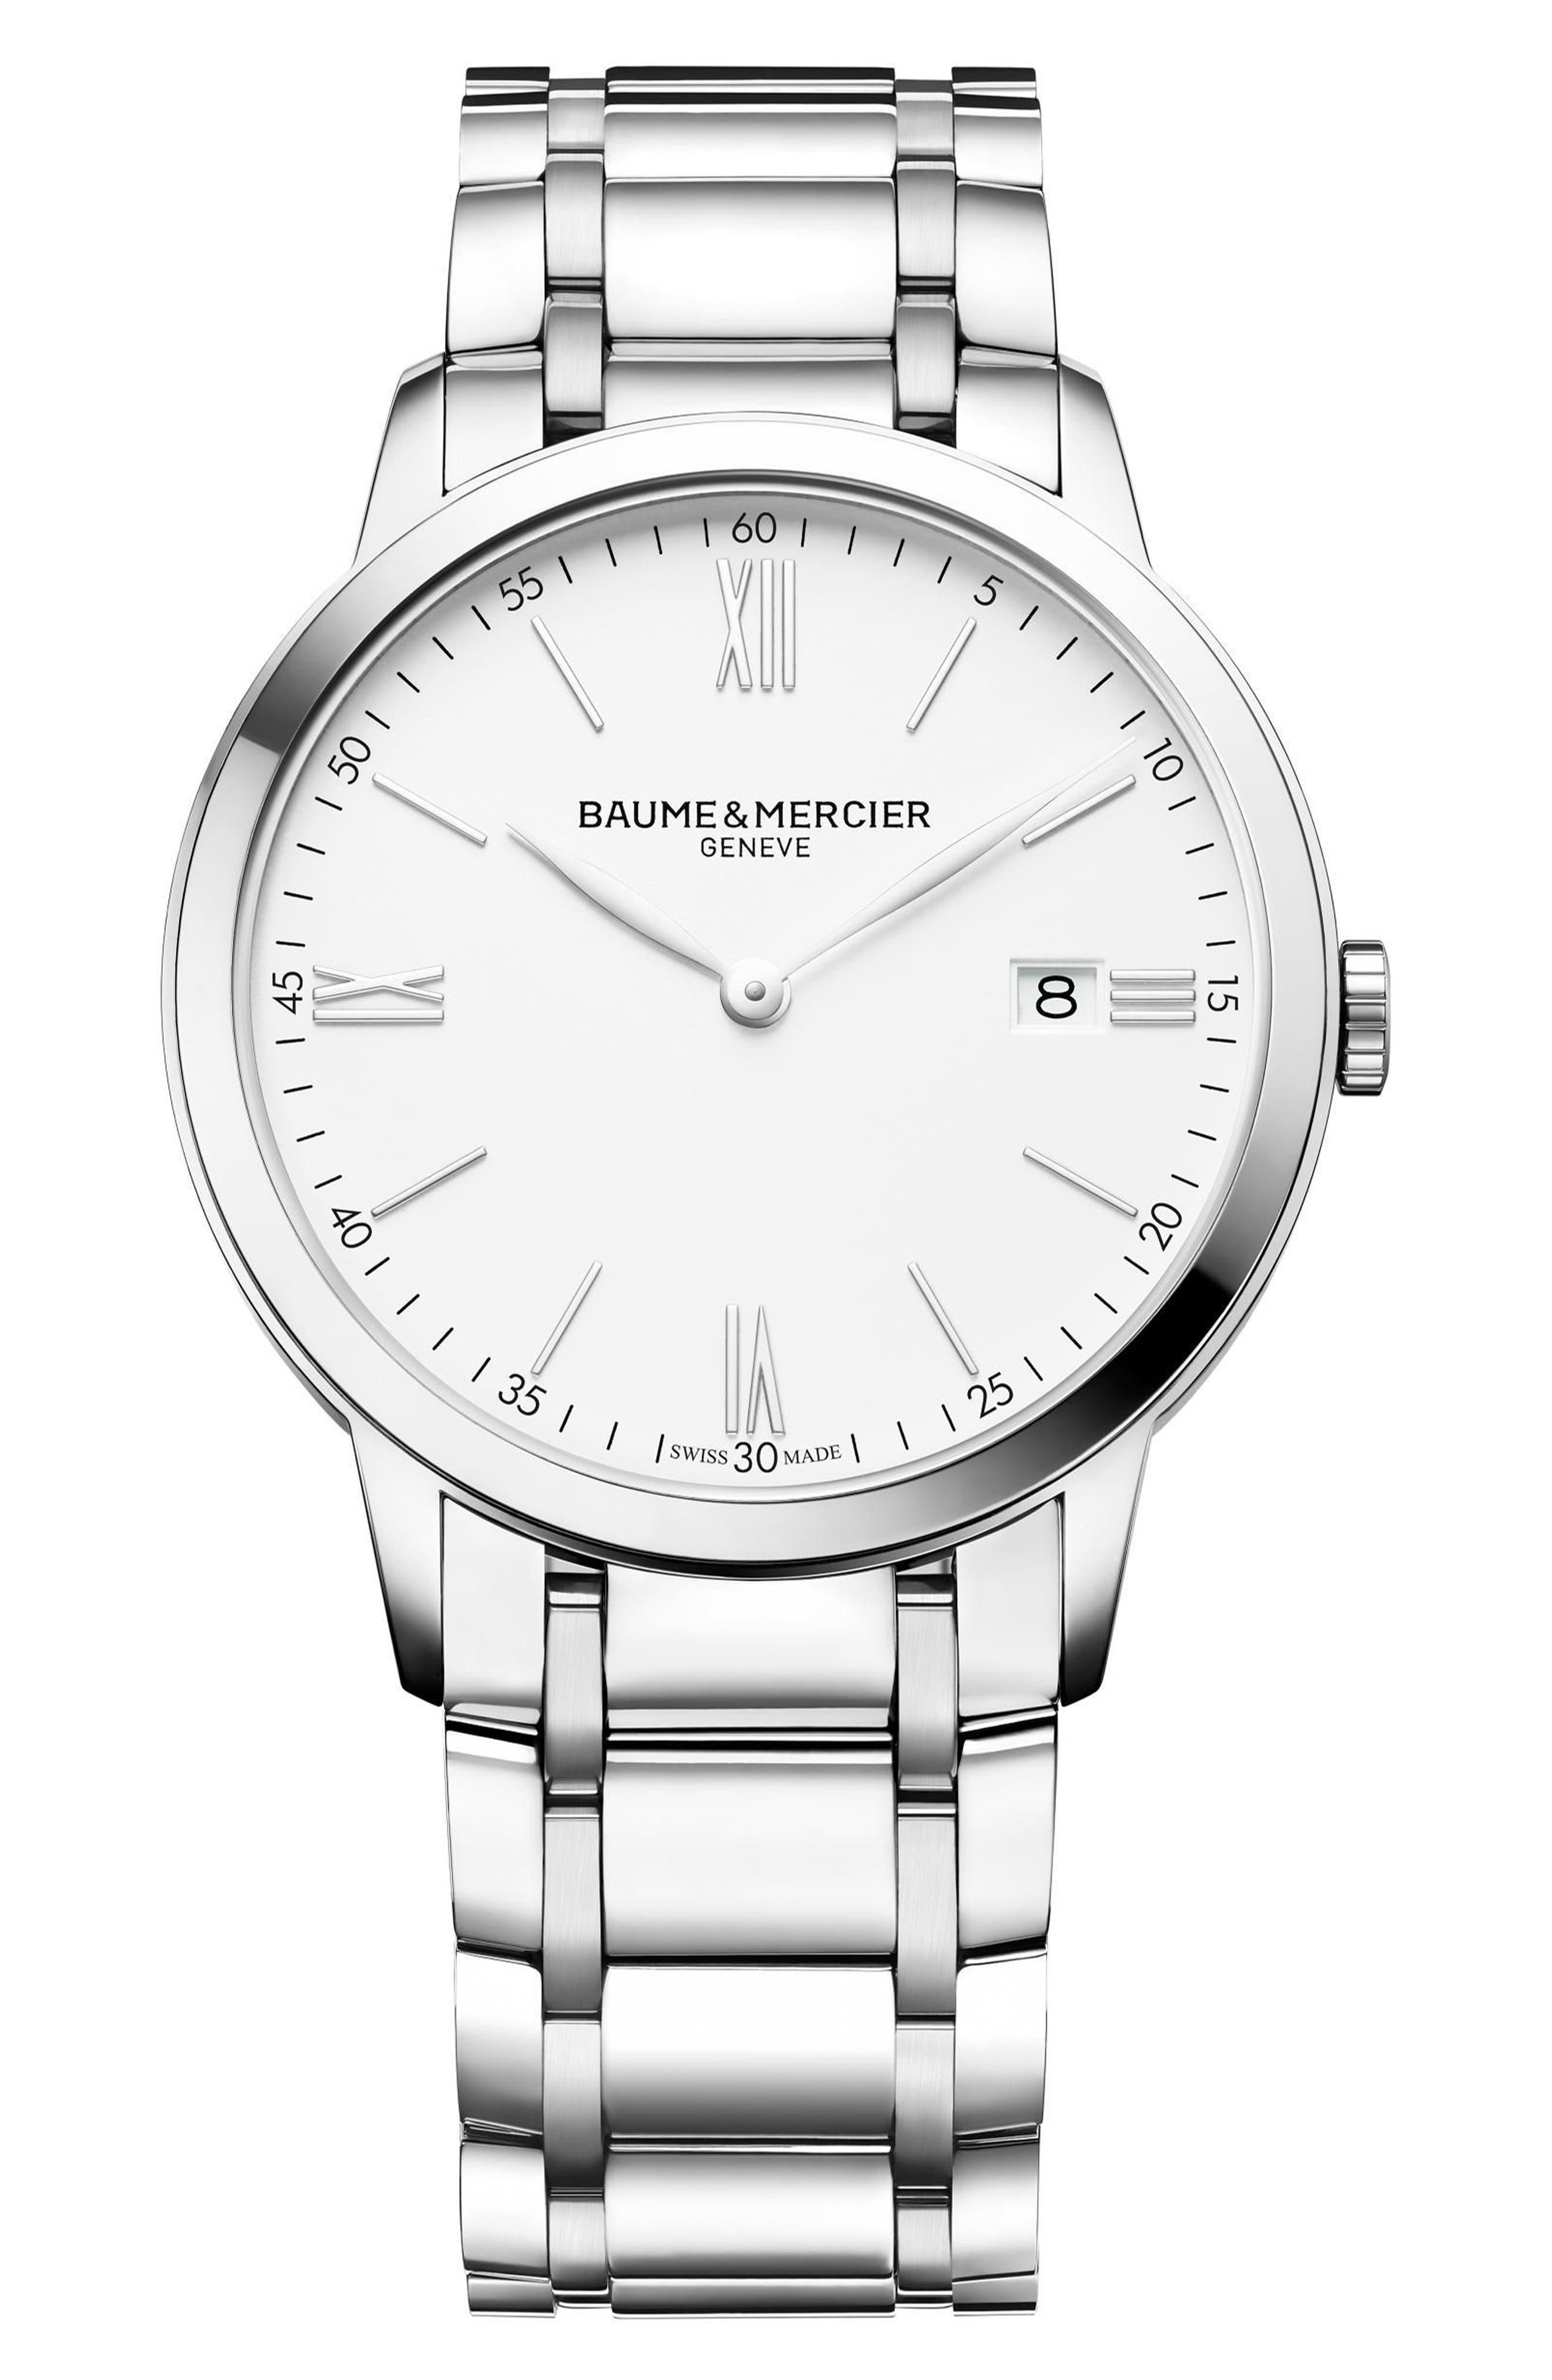 BAUME & MERCIER Classima 10354 Stainless Steel Bracelet Watch in White/Silver